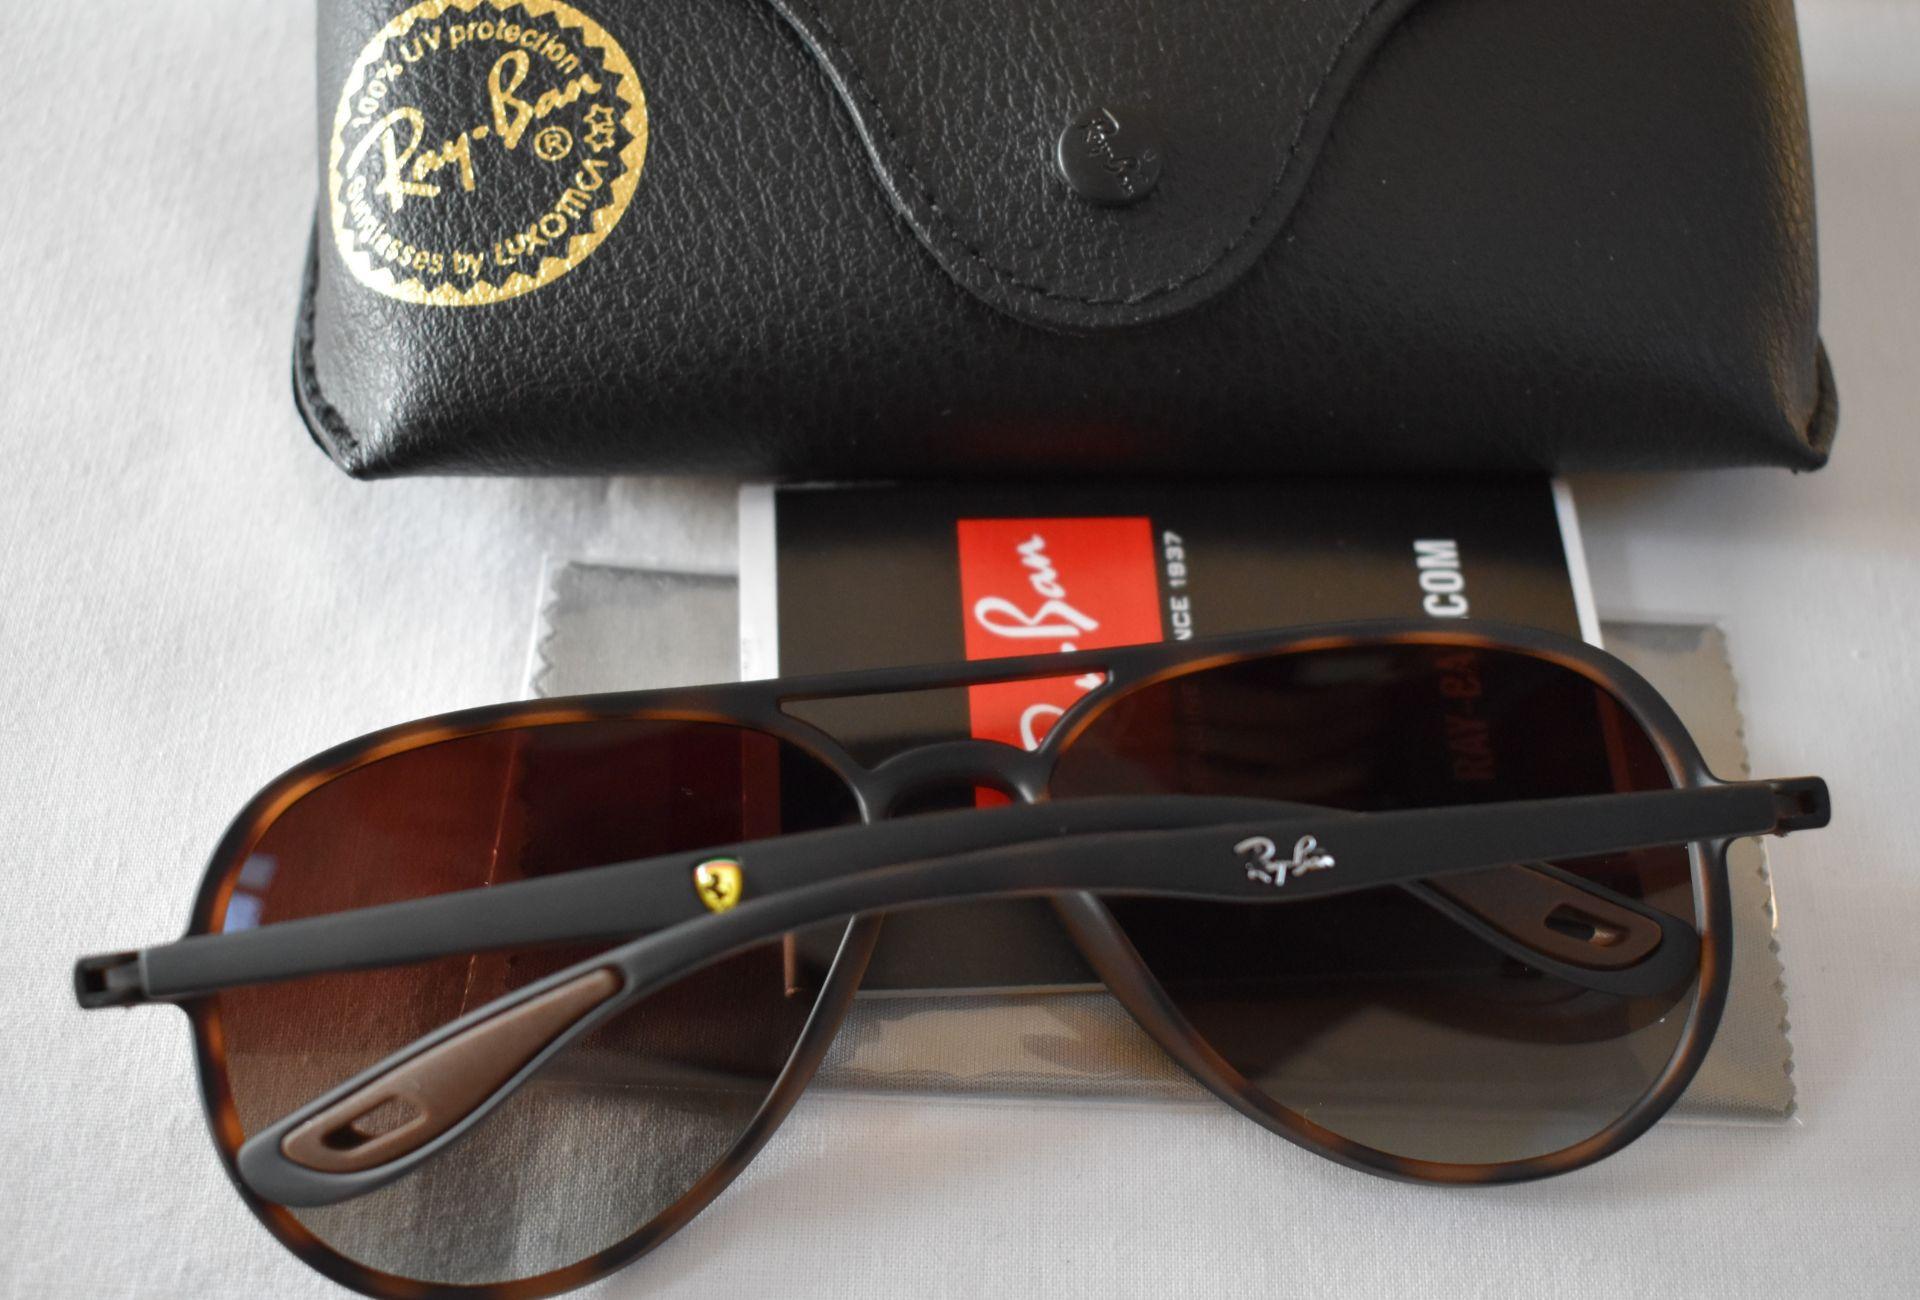 Ray Ban Sunglasses (Ferrari) ORB4320CH 865/T5 *3P - Image 2 of 3